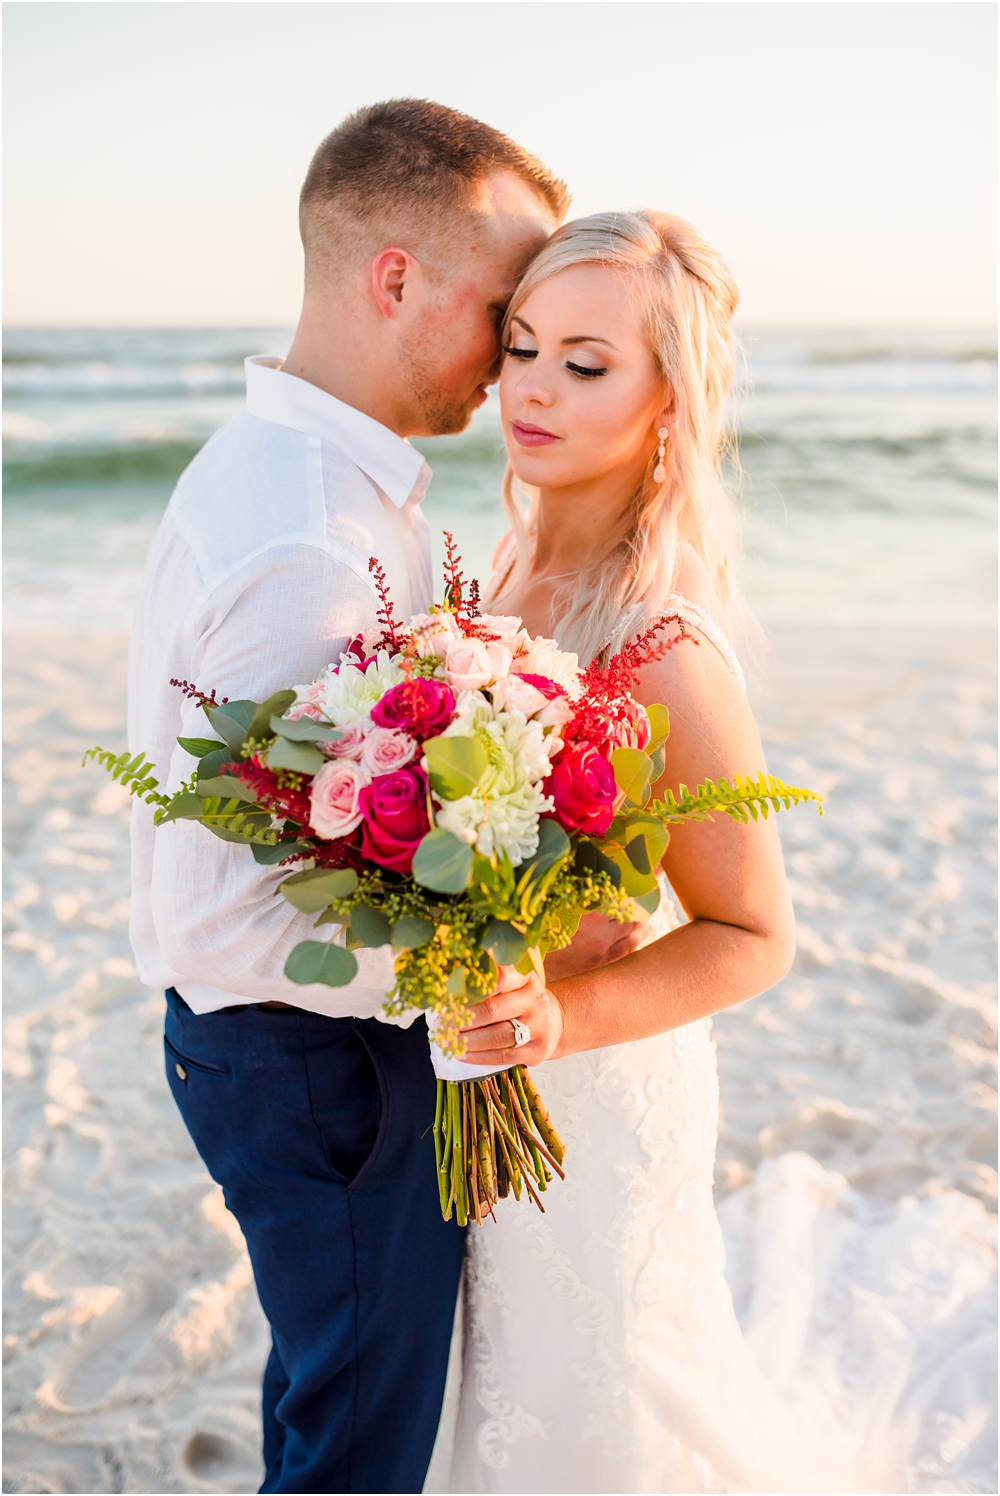 mcglothlin-wedding-kiersten-stevenson-photography-30a-panama-city-beach-dothan-tallahassee-(103-of-145).jpg